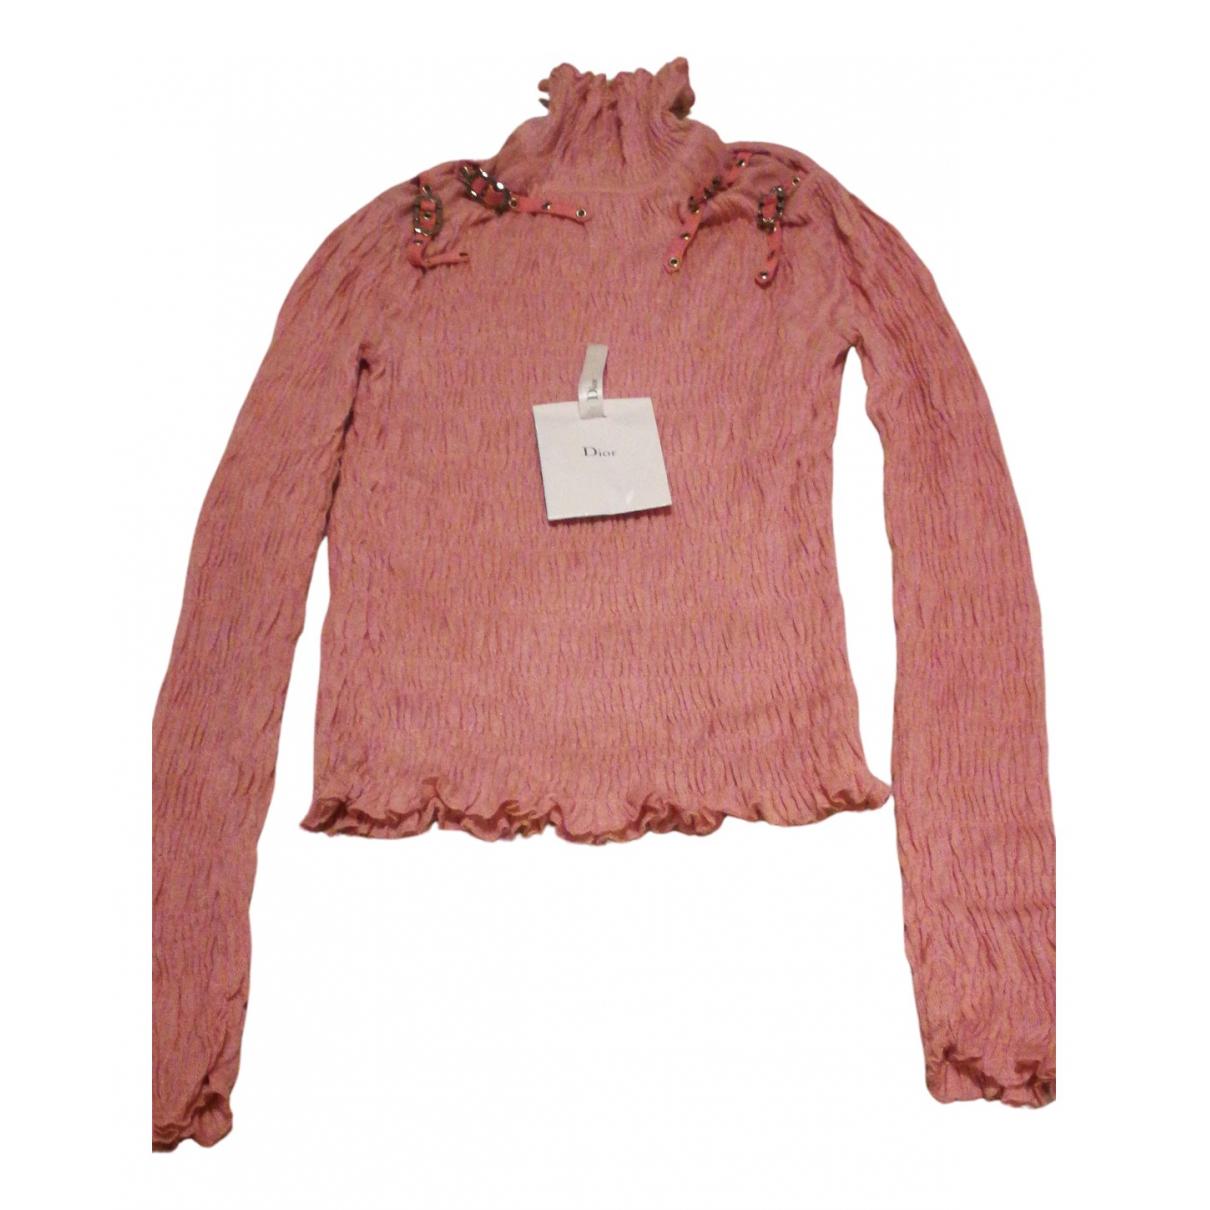 Dior N Pink Cashmere Knitwear for Women 42 FR